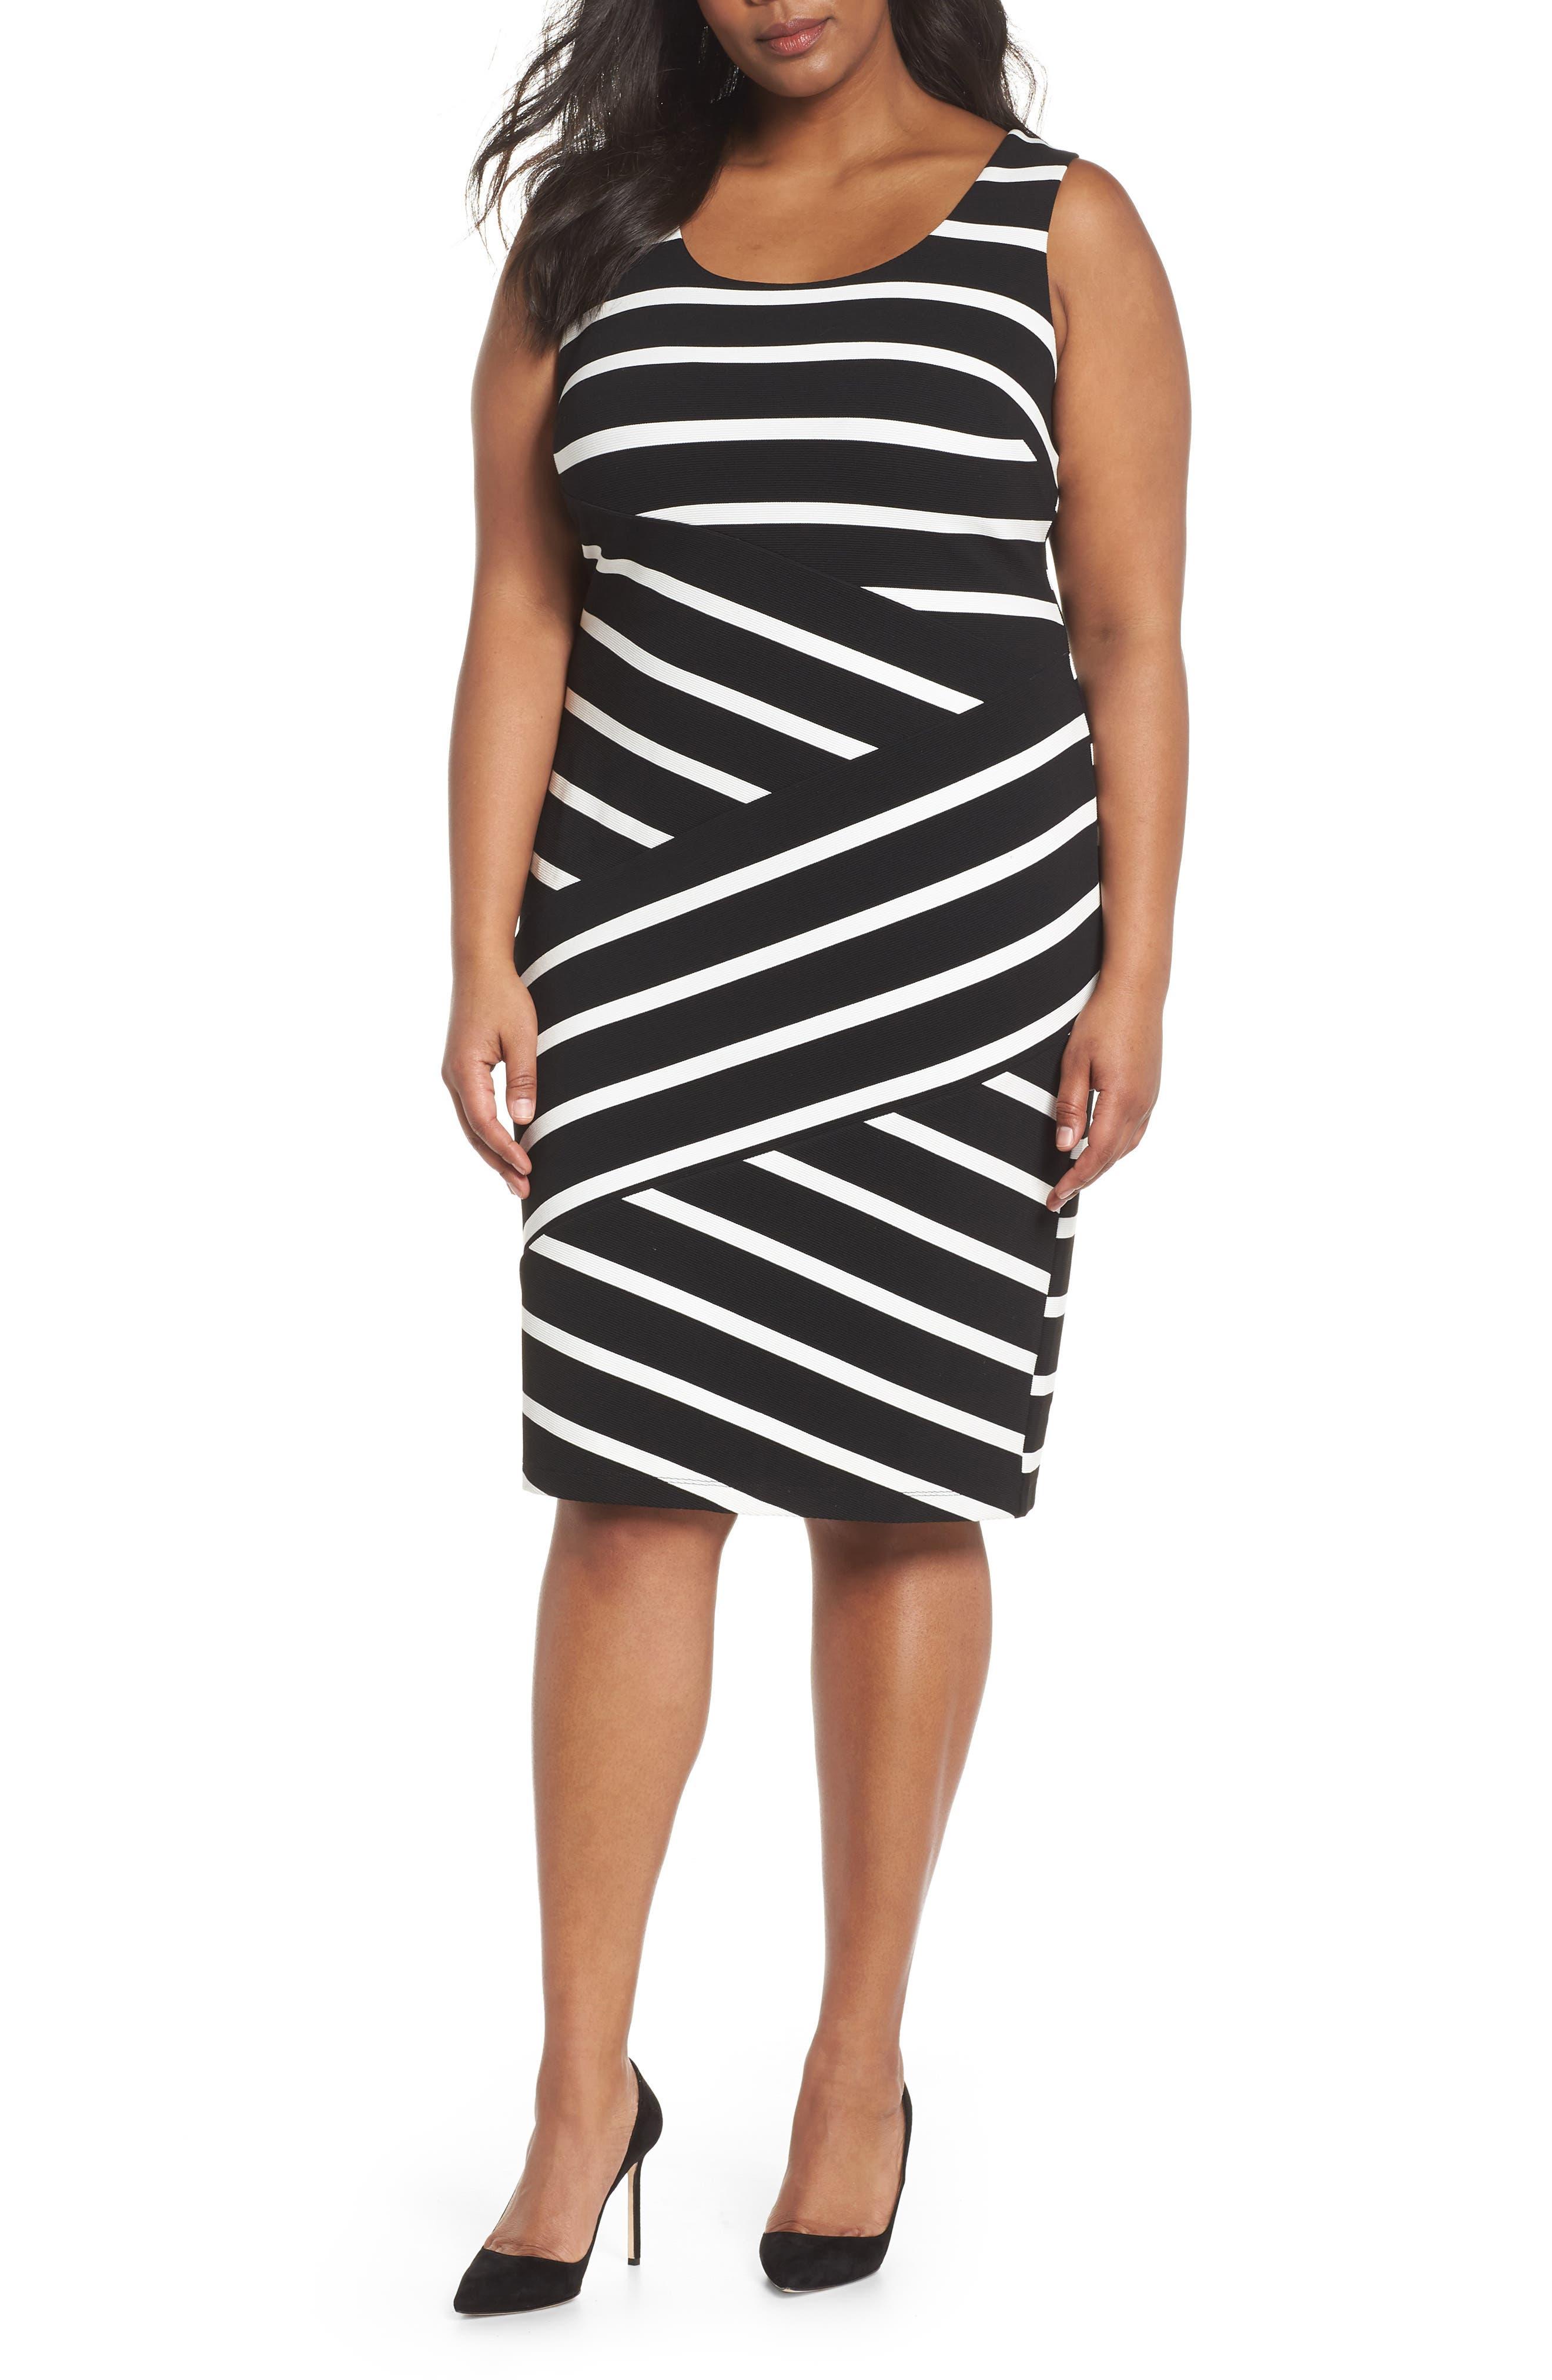 Ottoman Striped Sheath Dress,                             Main thumbnail 1, color,                             Black/ Ivory